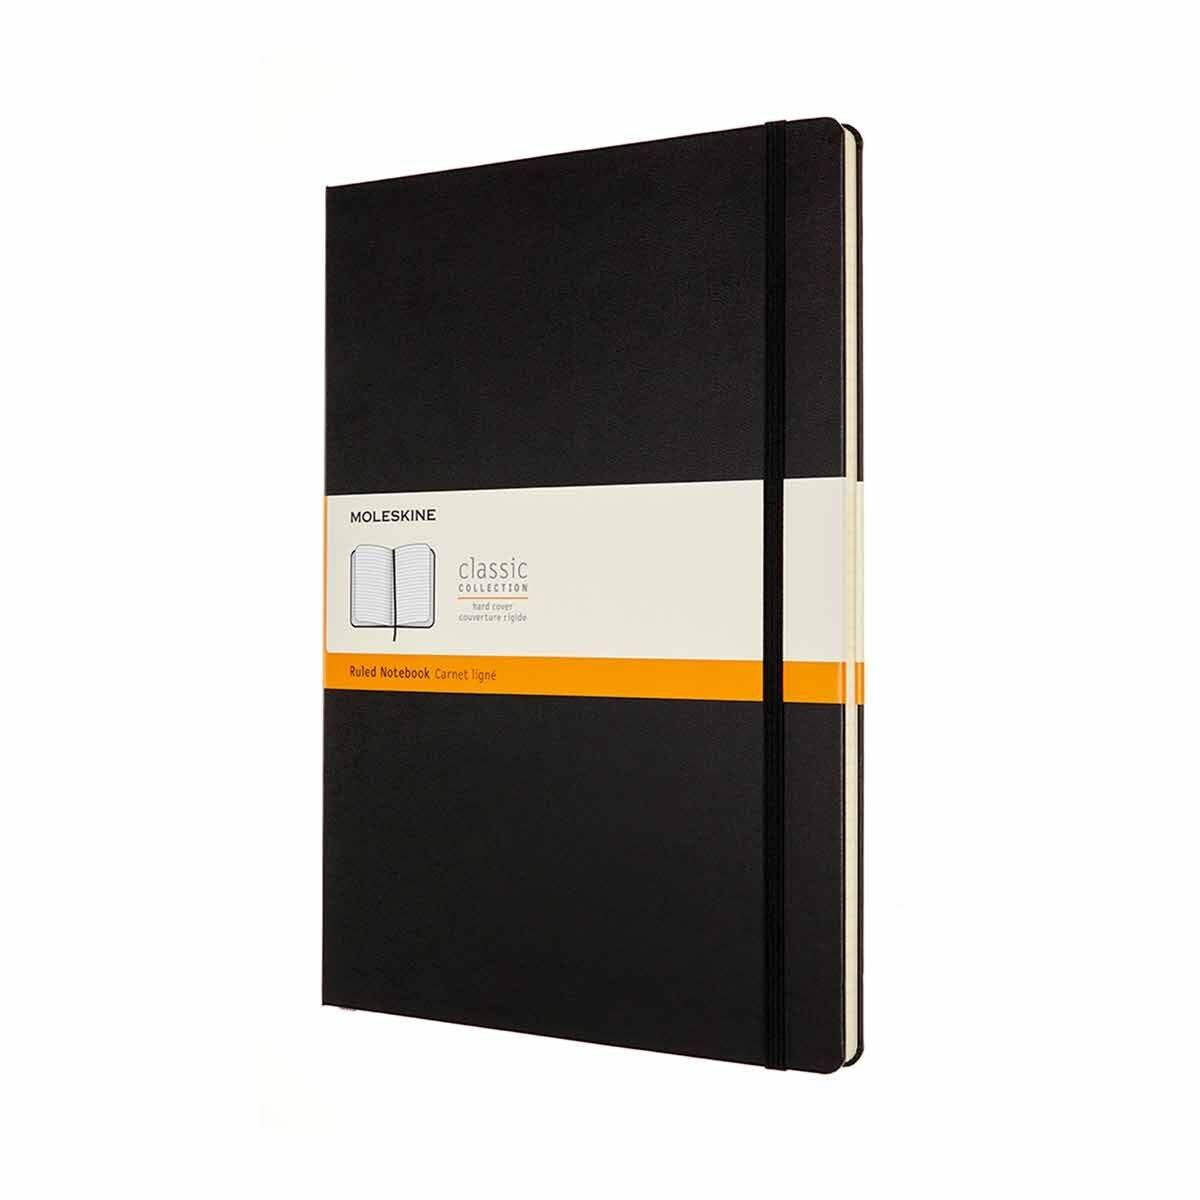 Moleskine Hardcover Notebook A4 Ruled Black